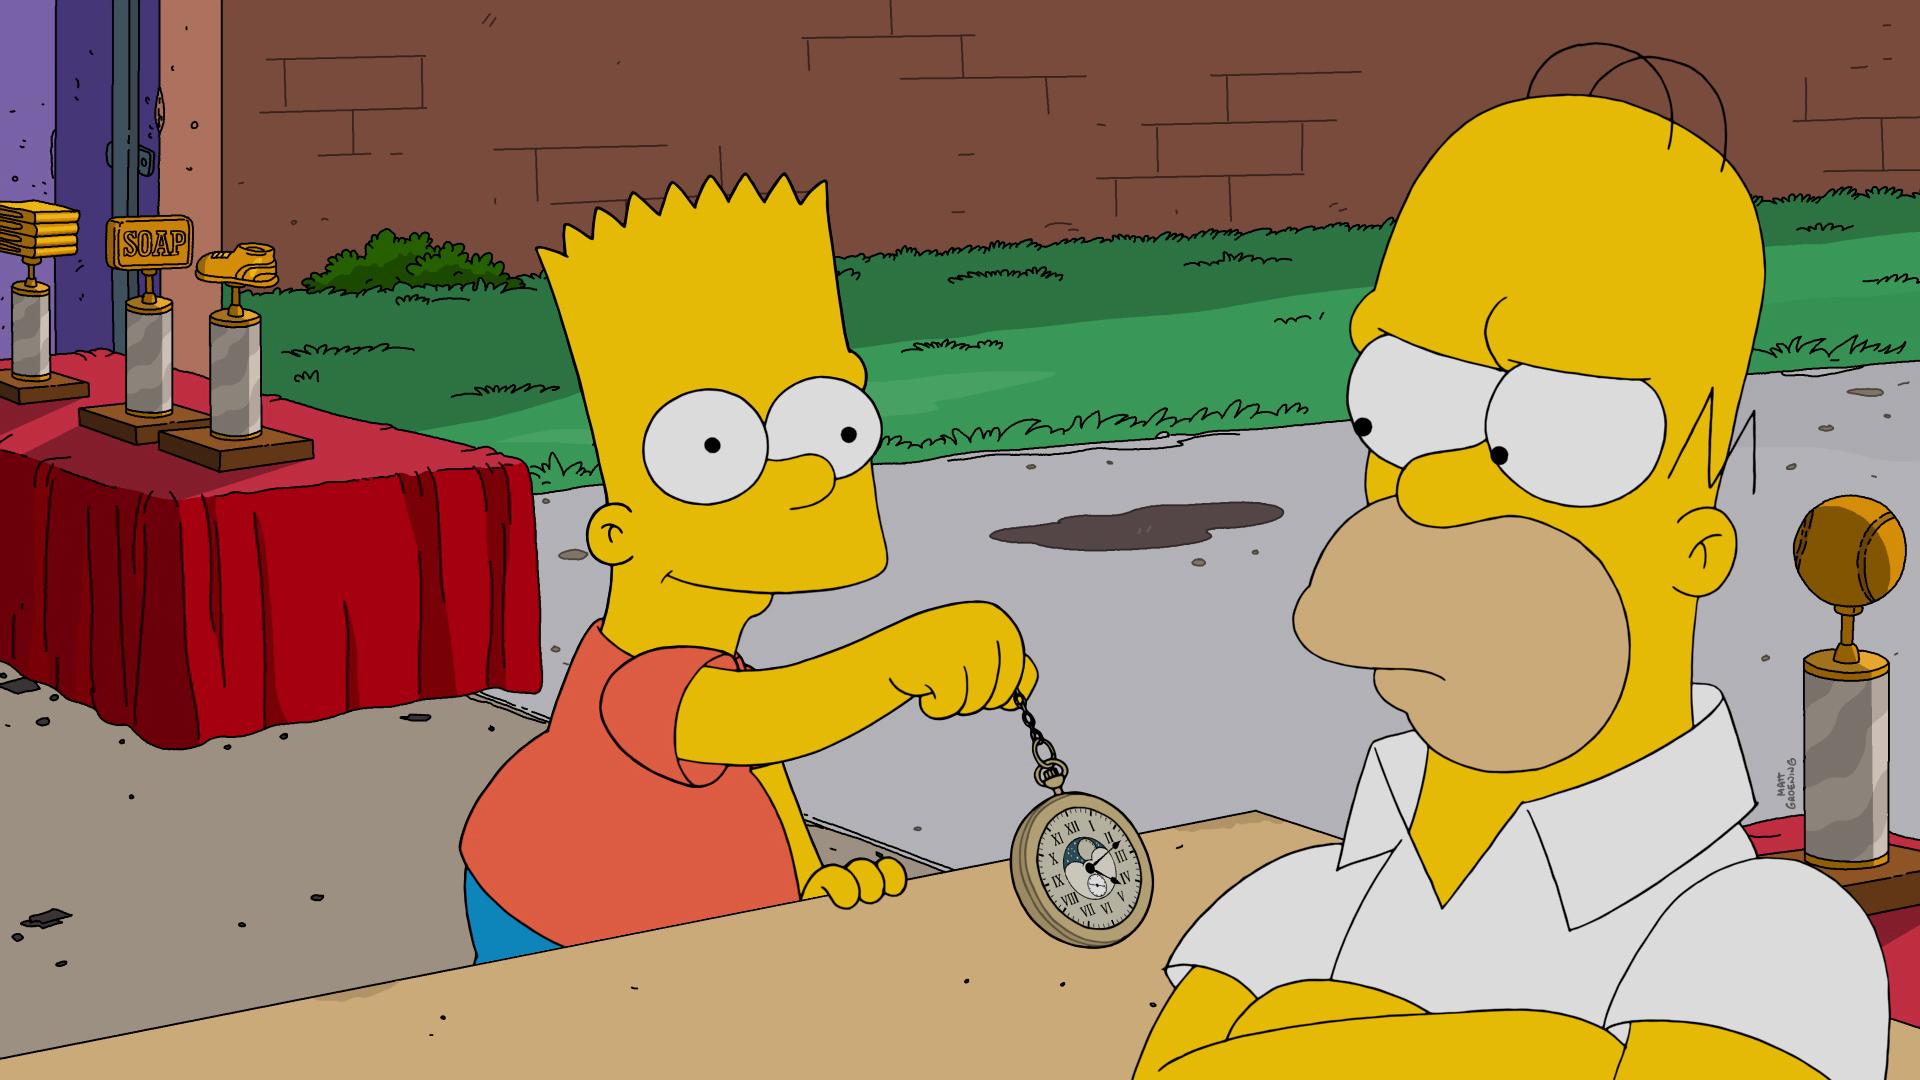 The simpsons season 27 photo gallery - Marge simpson et bart ...